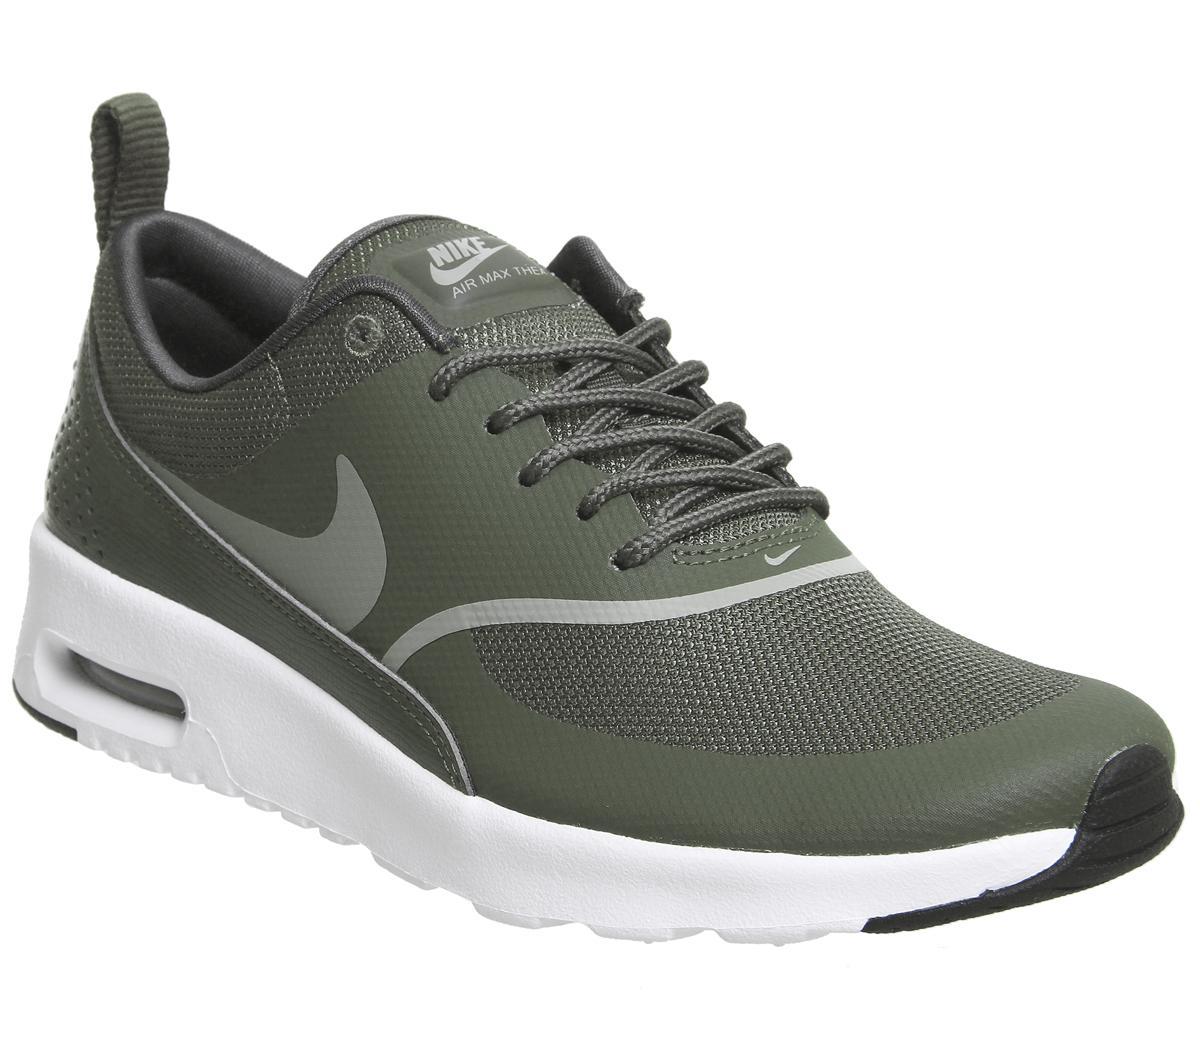 Nike Air Max Thea Trainers Cargo Khaki White - Sneaker damen